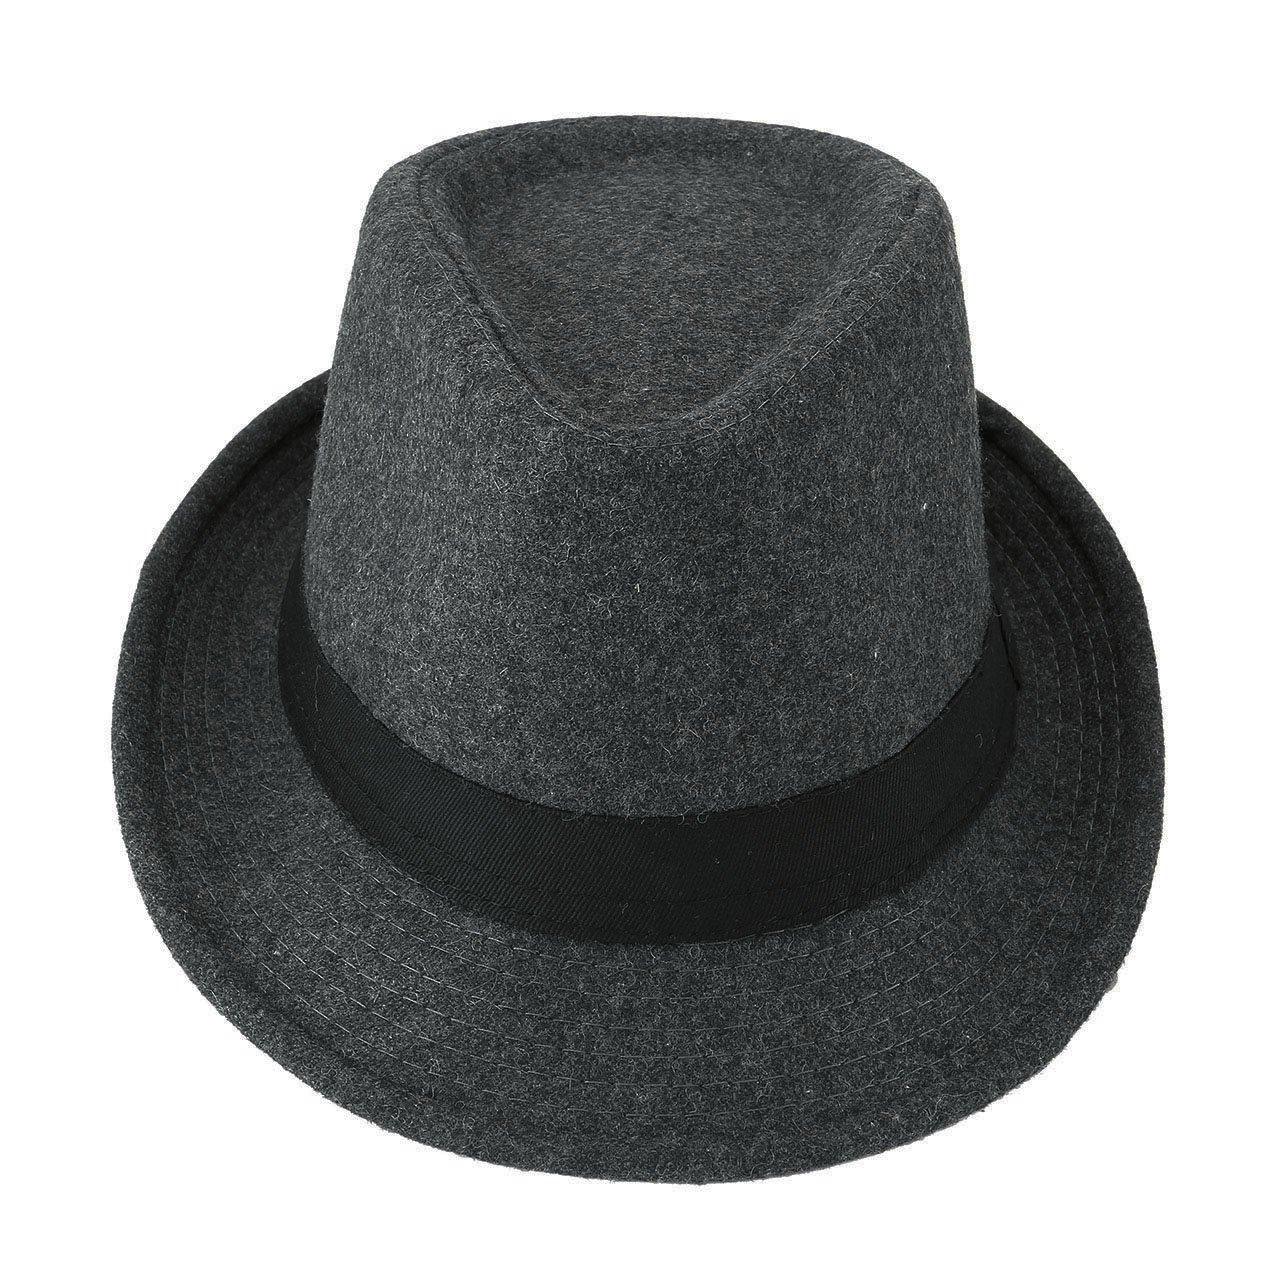 Unisex Classic Manhattan Fedora Hat Black Band Fashion Casual Jazz Wool Cap (Grey) by Faleto (Image #2)